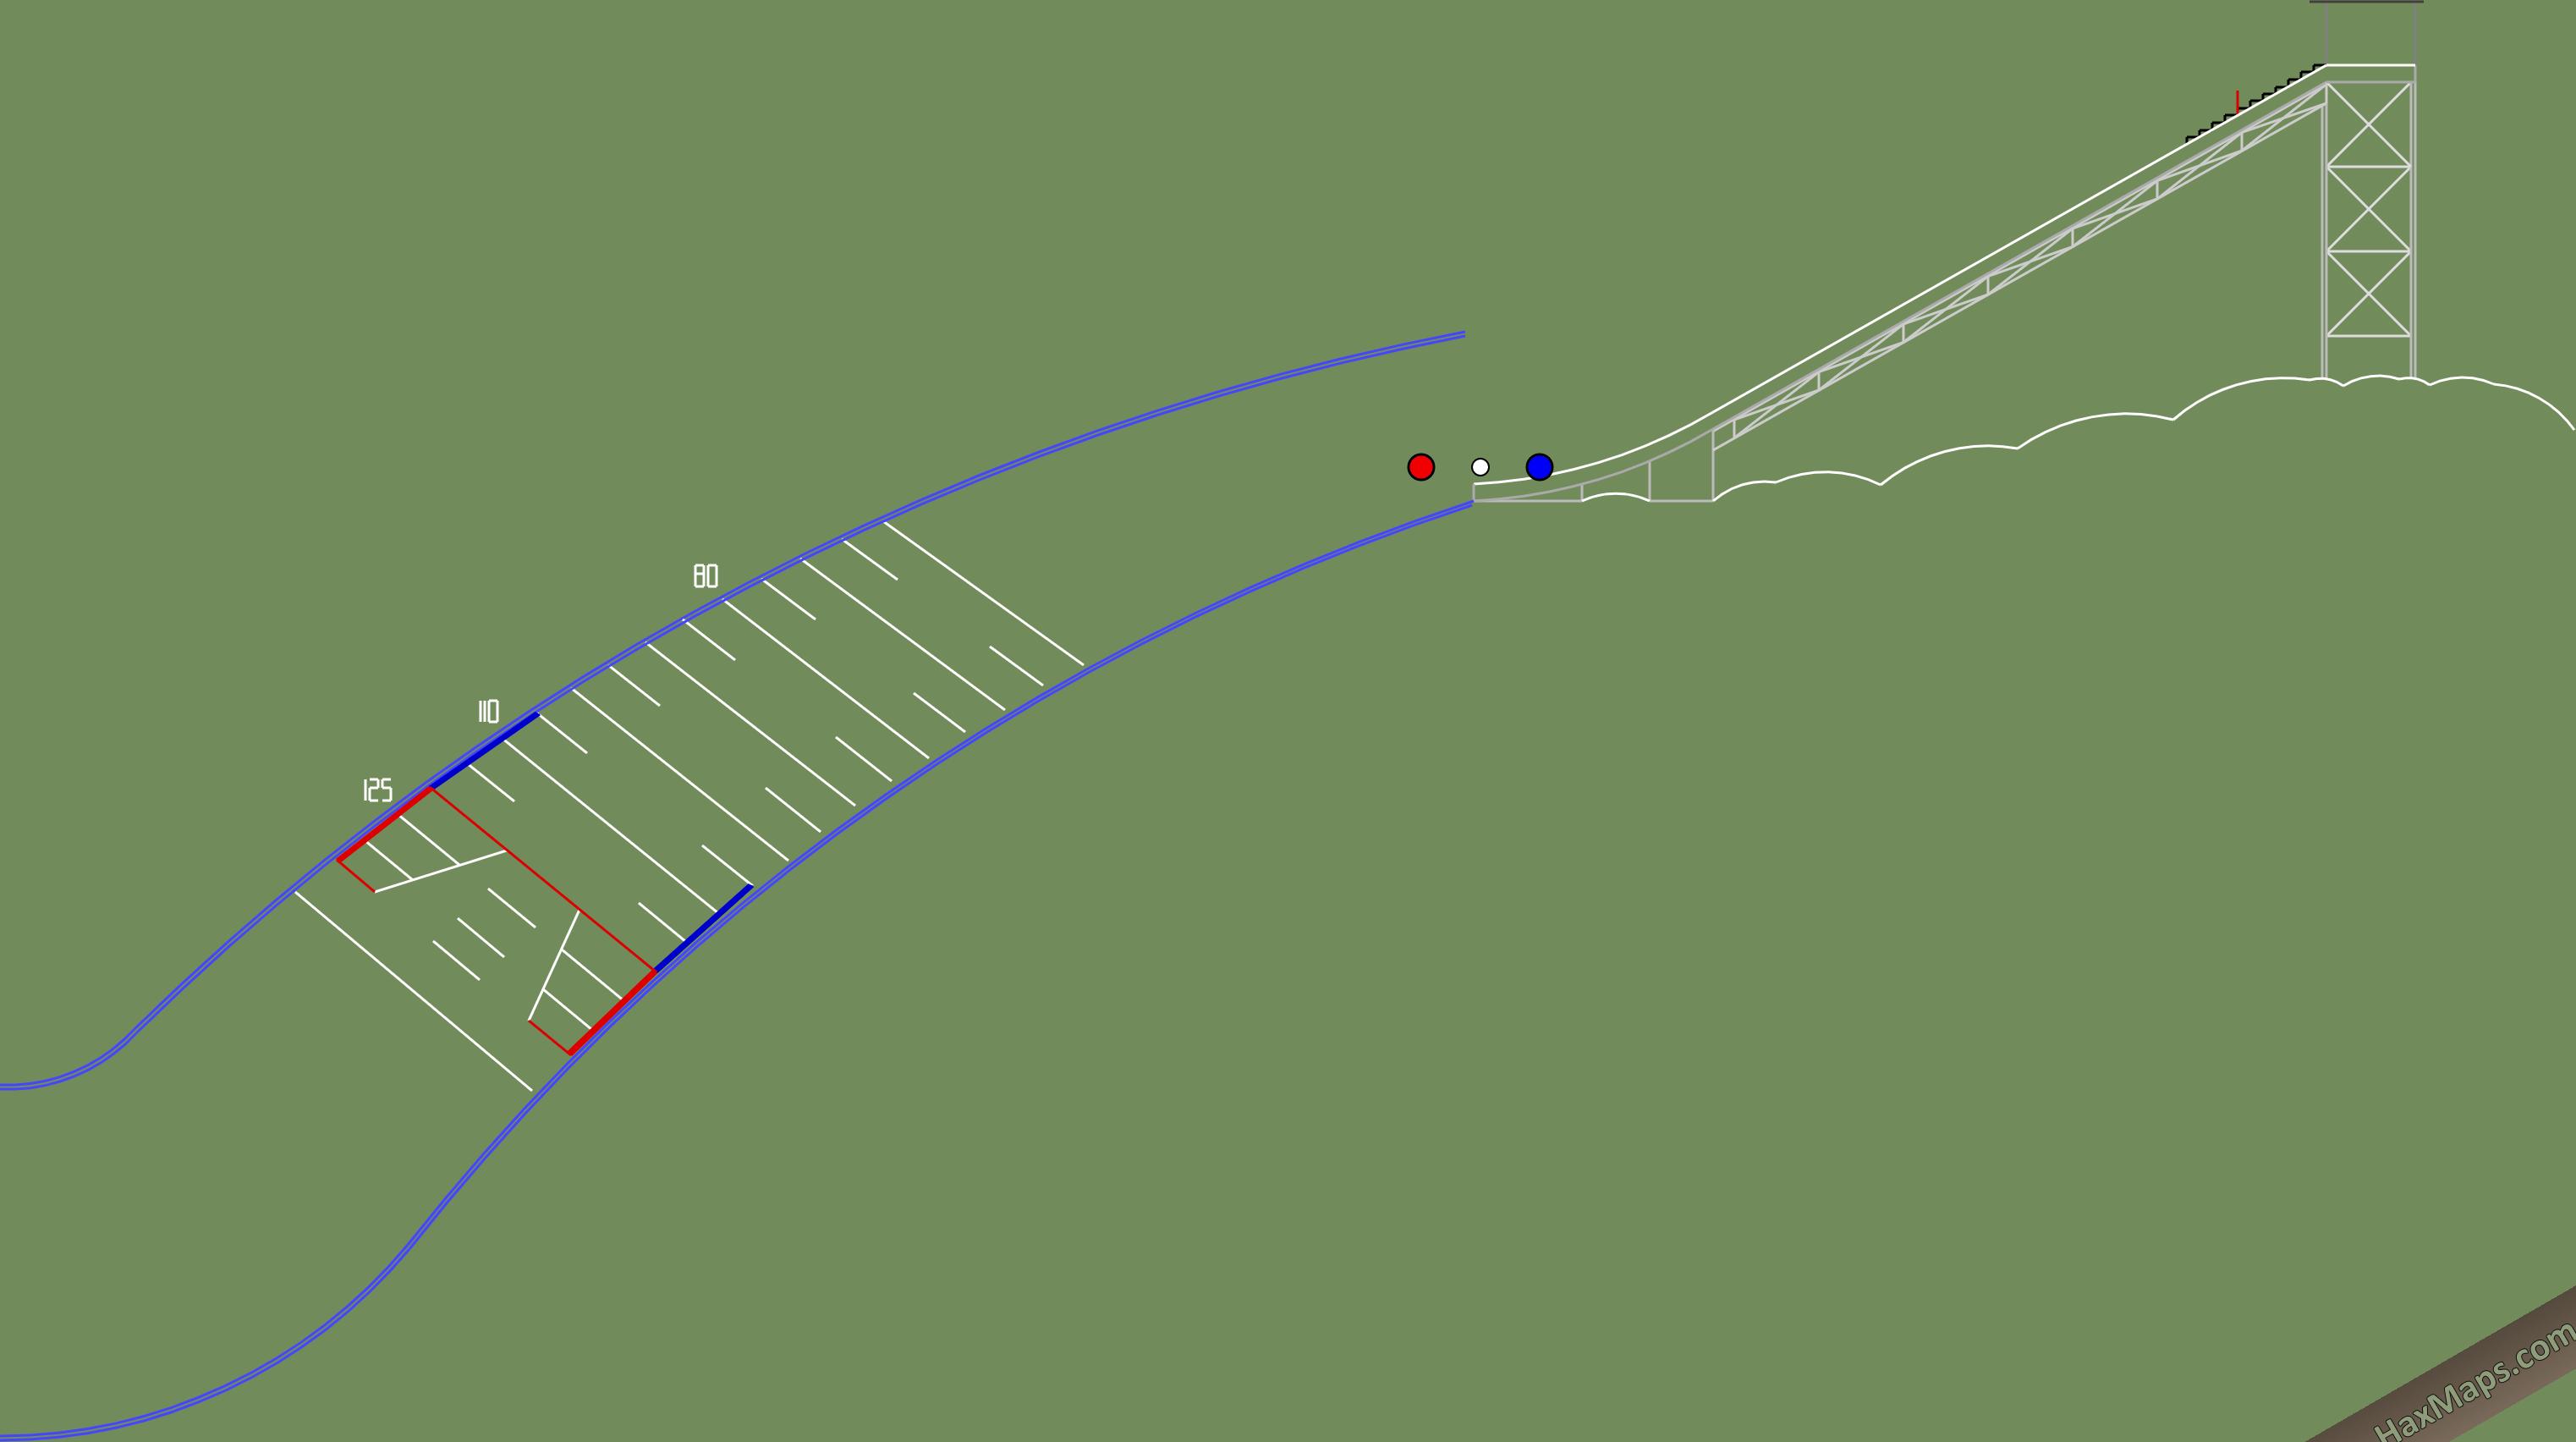 hax ball maps | Niżny Tagił HS 134 by Wyspy S v2